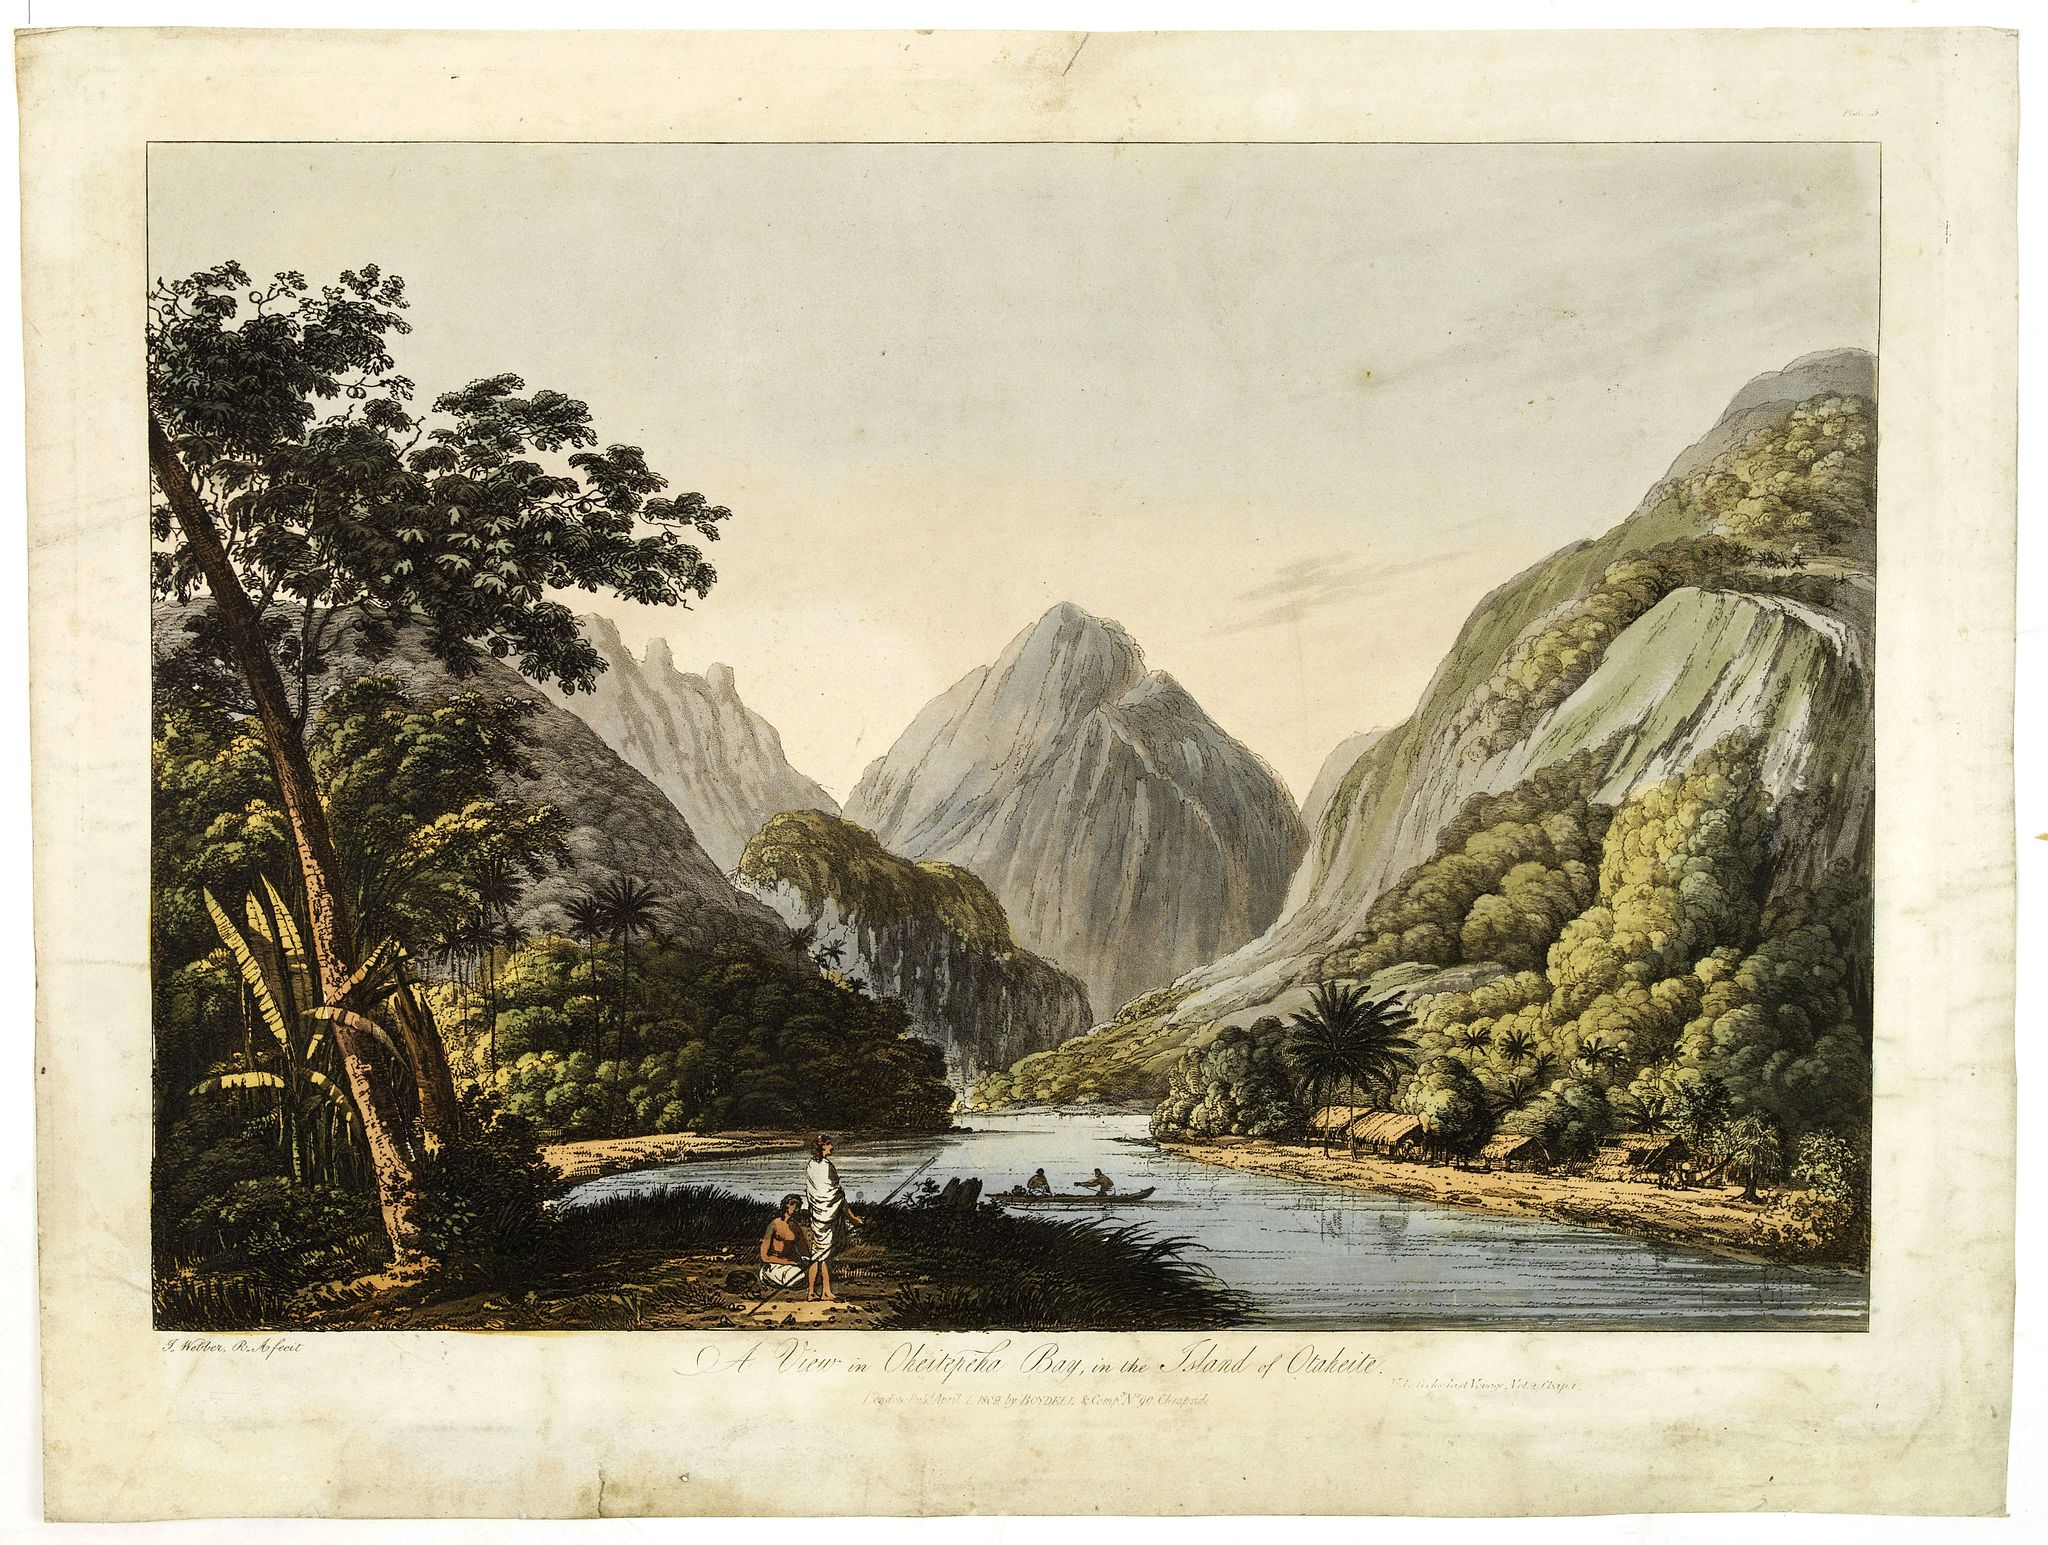 WEBBER, J. -  A view in Oheitepeha Bay in the Island of Otaheite. (Tahiti)